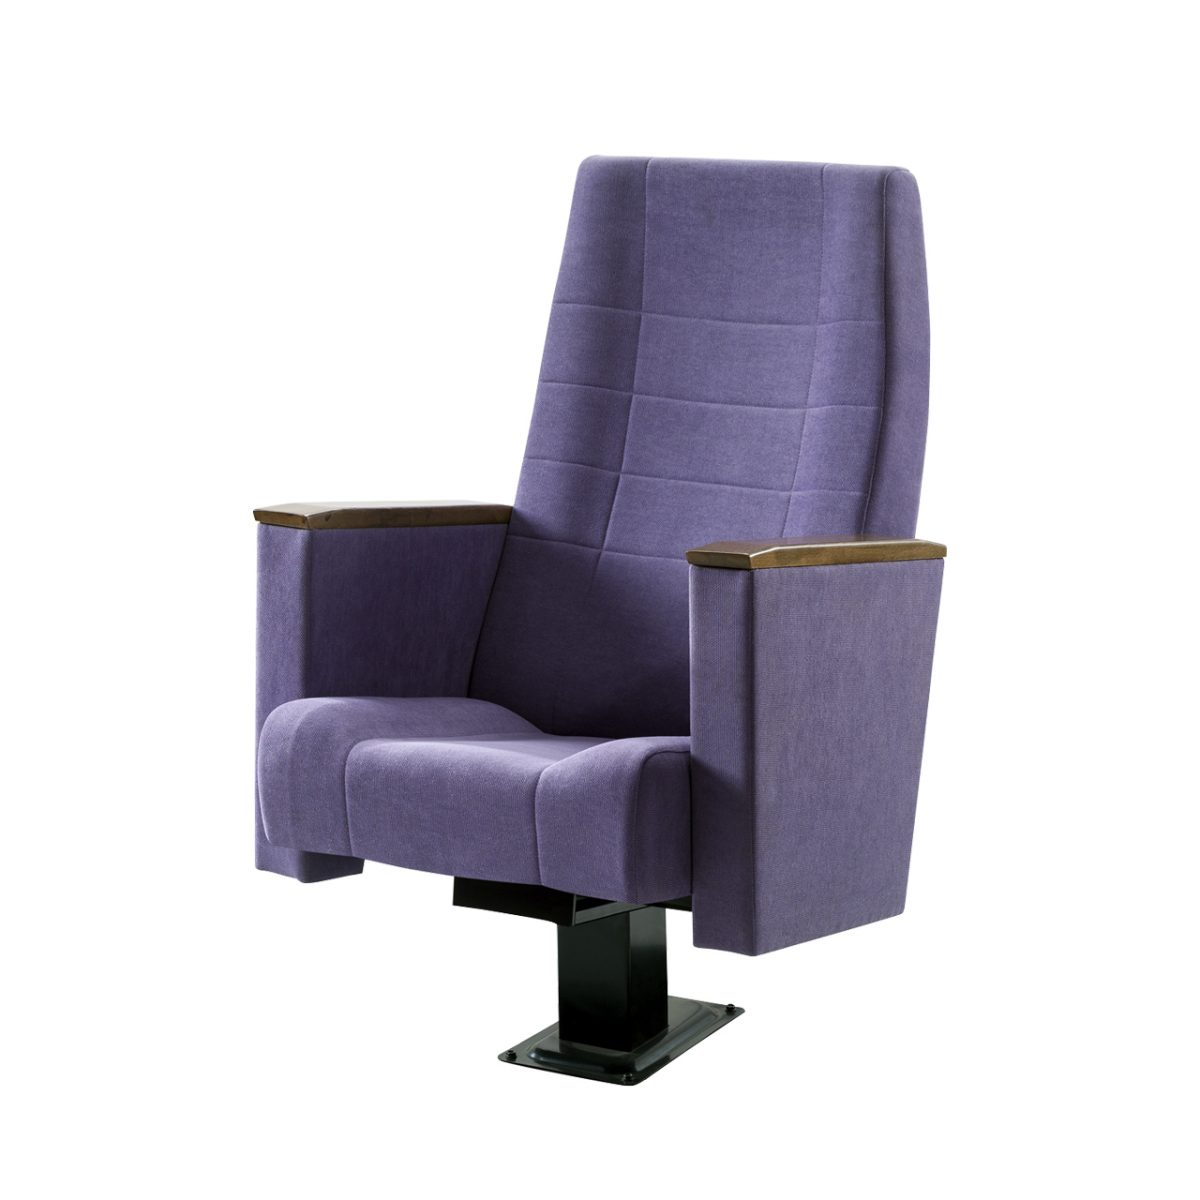 Amara Konferans Salonu Sandalyeleri